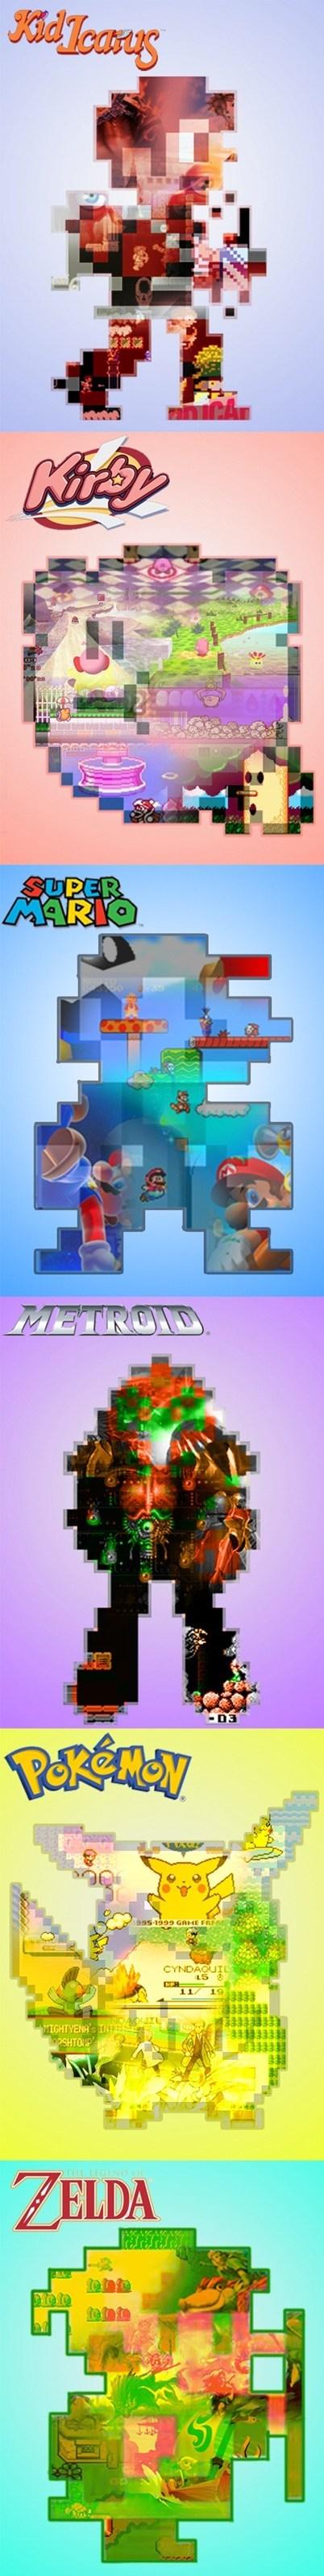 Pokémon retro kirby Metroid posters kid icarus 8 bit zelda mario nintendo - 7114138112